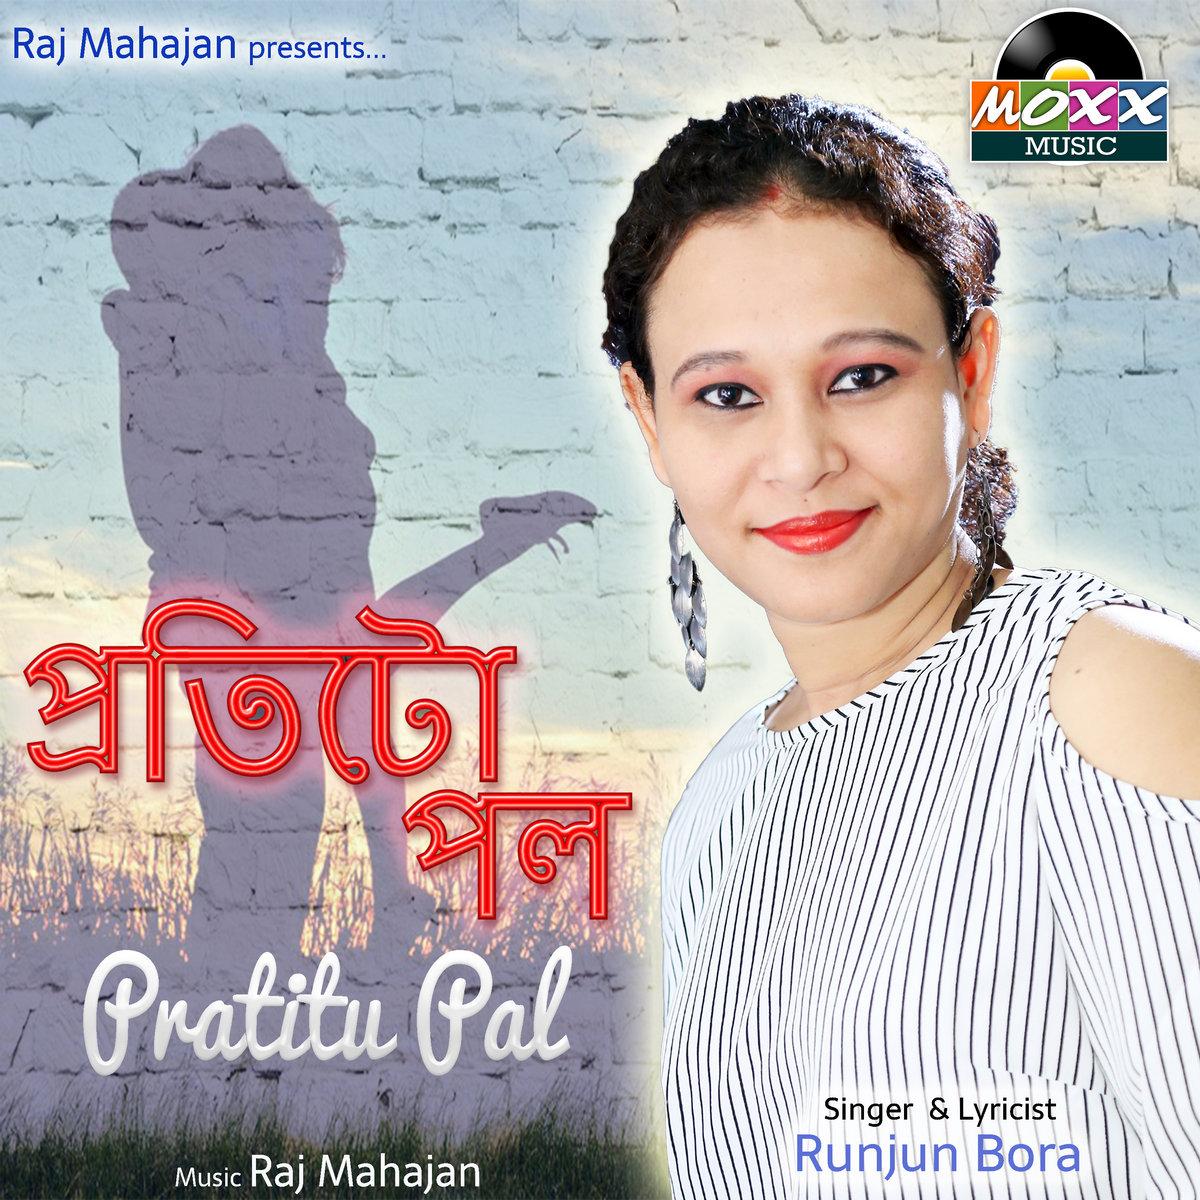 shikari mp3 songs free download 320kbps